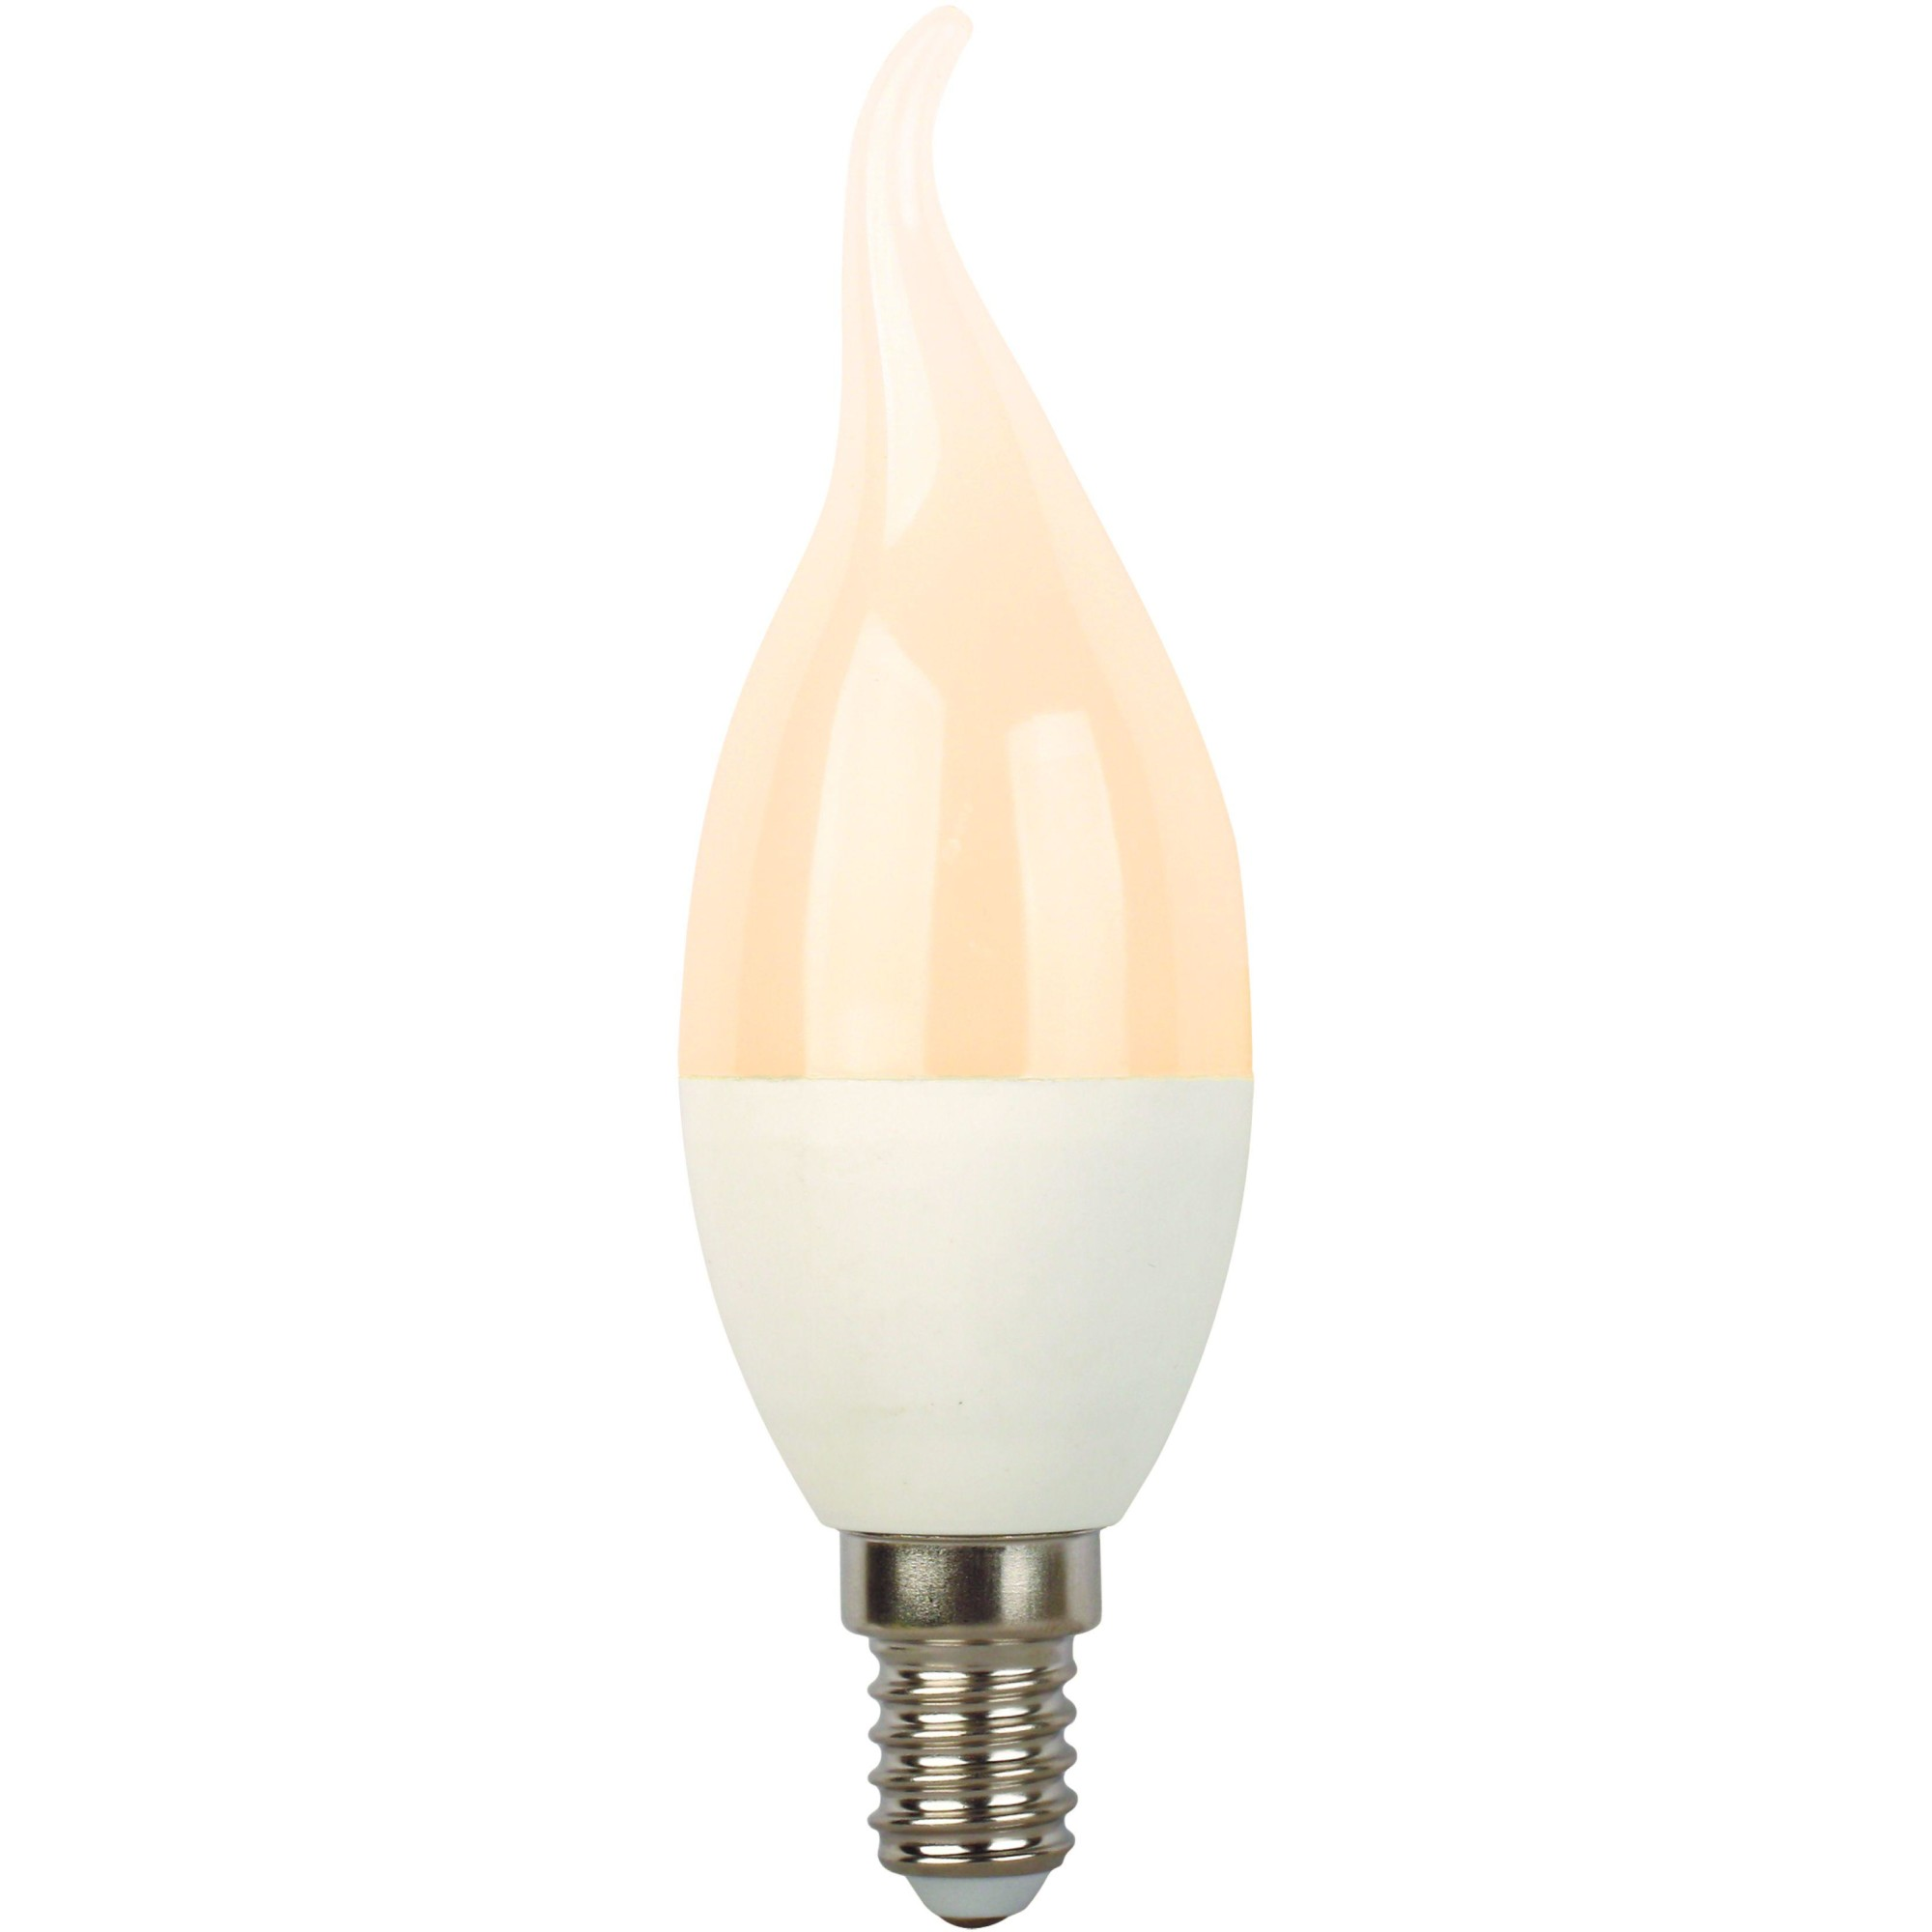 Лампа Ecola Premium светодионая E14 8 Вт свеча на ветру 640 Лм теплый свет